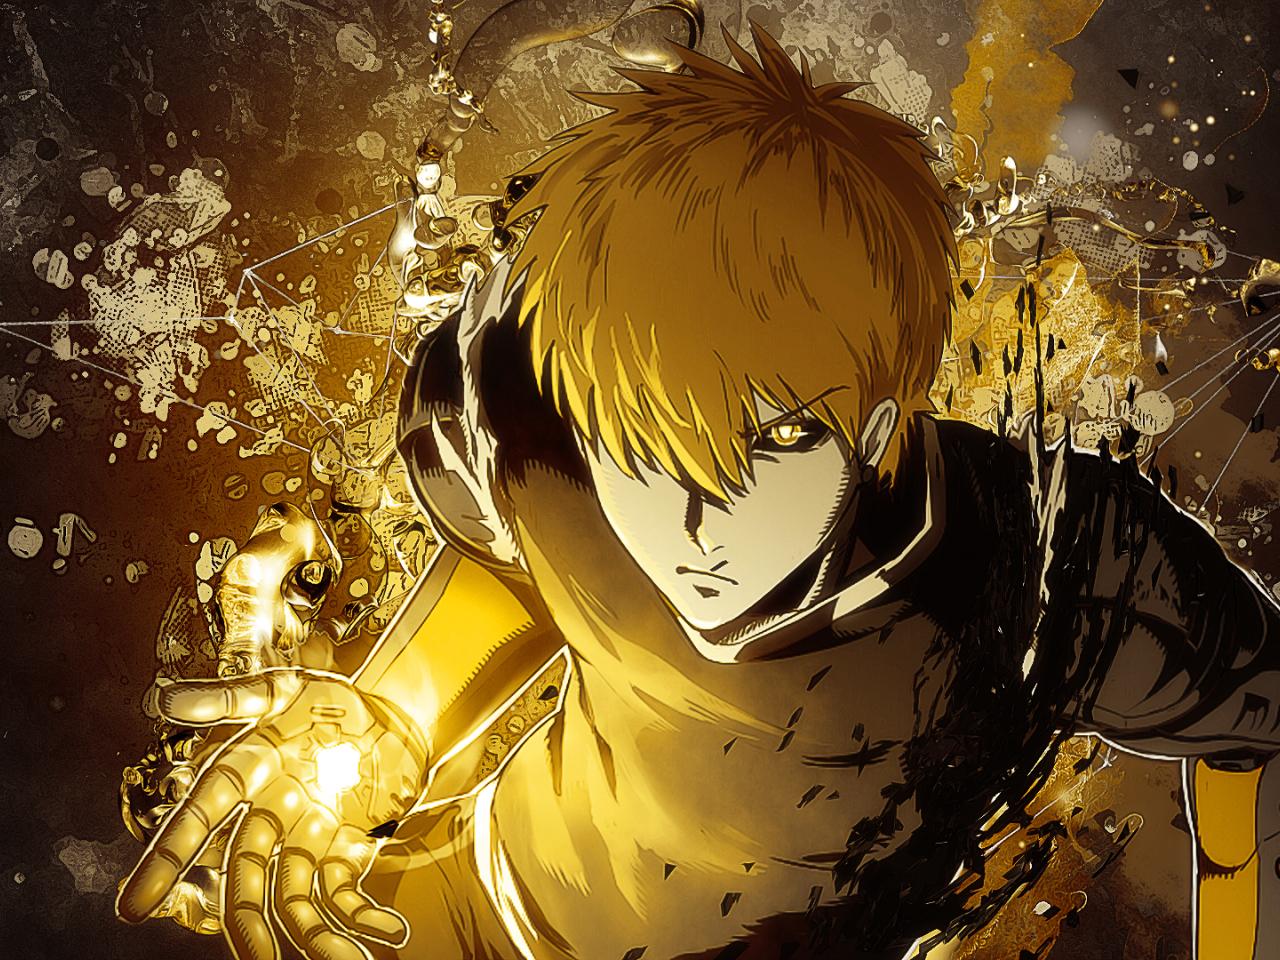 14+ Wallpaper Anime One Punch Man Genos - Tachi Wallpaper